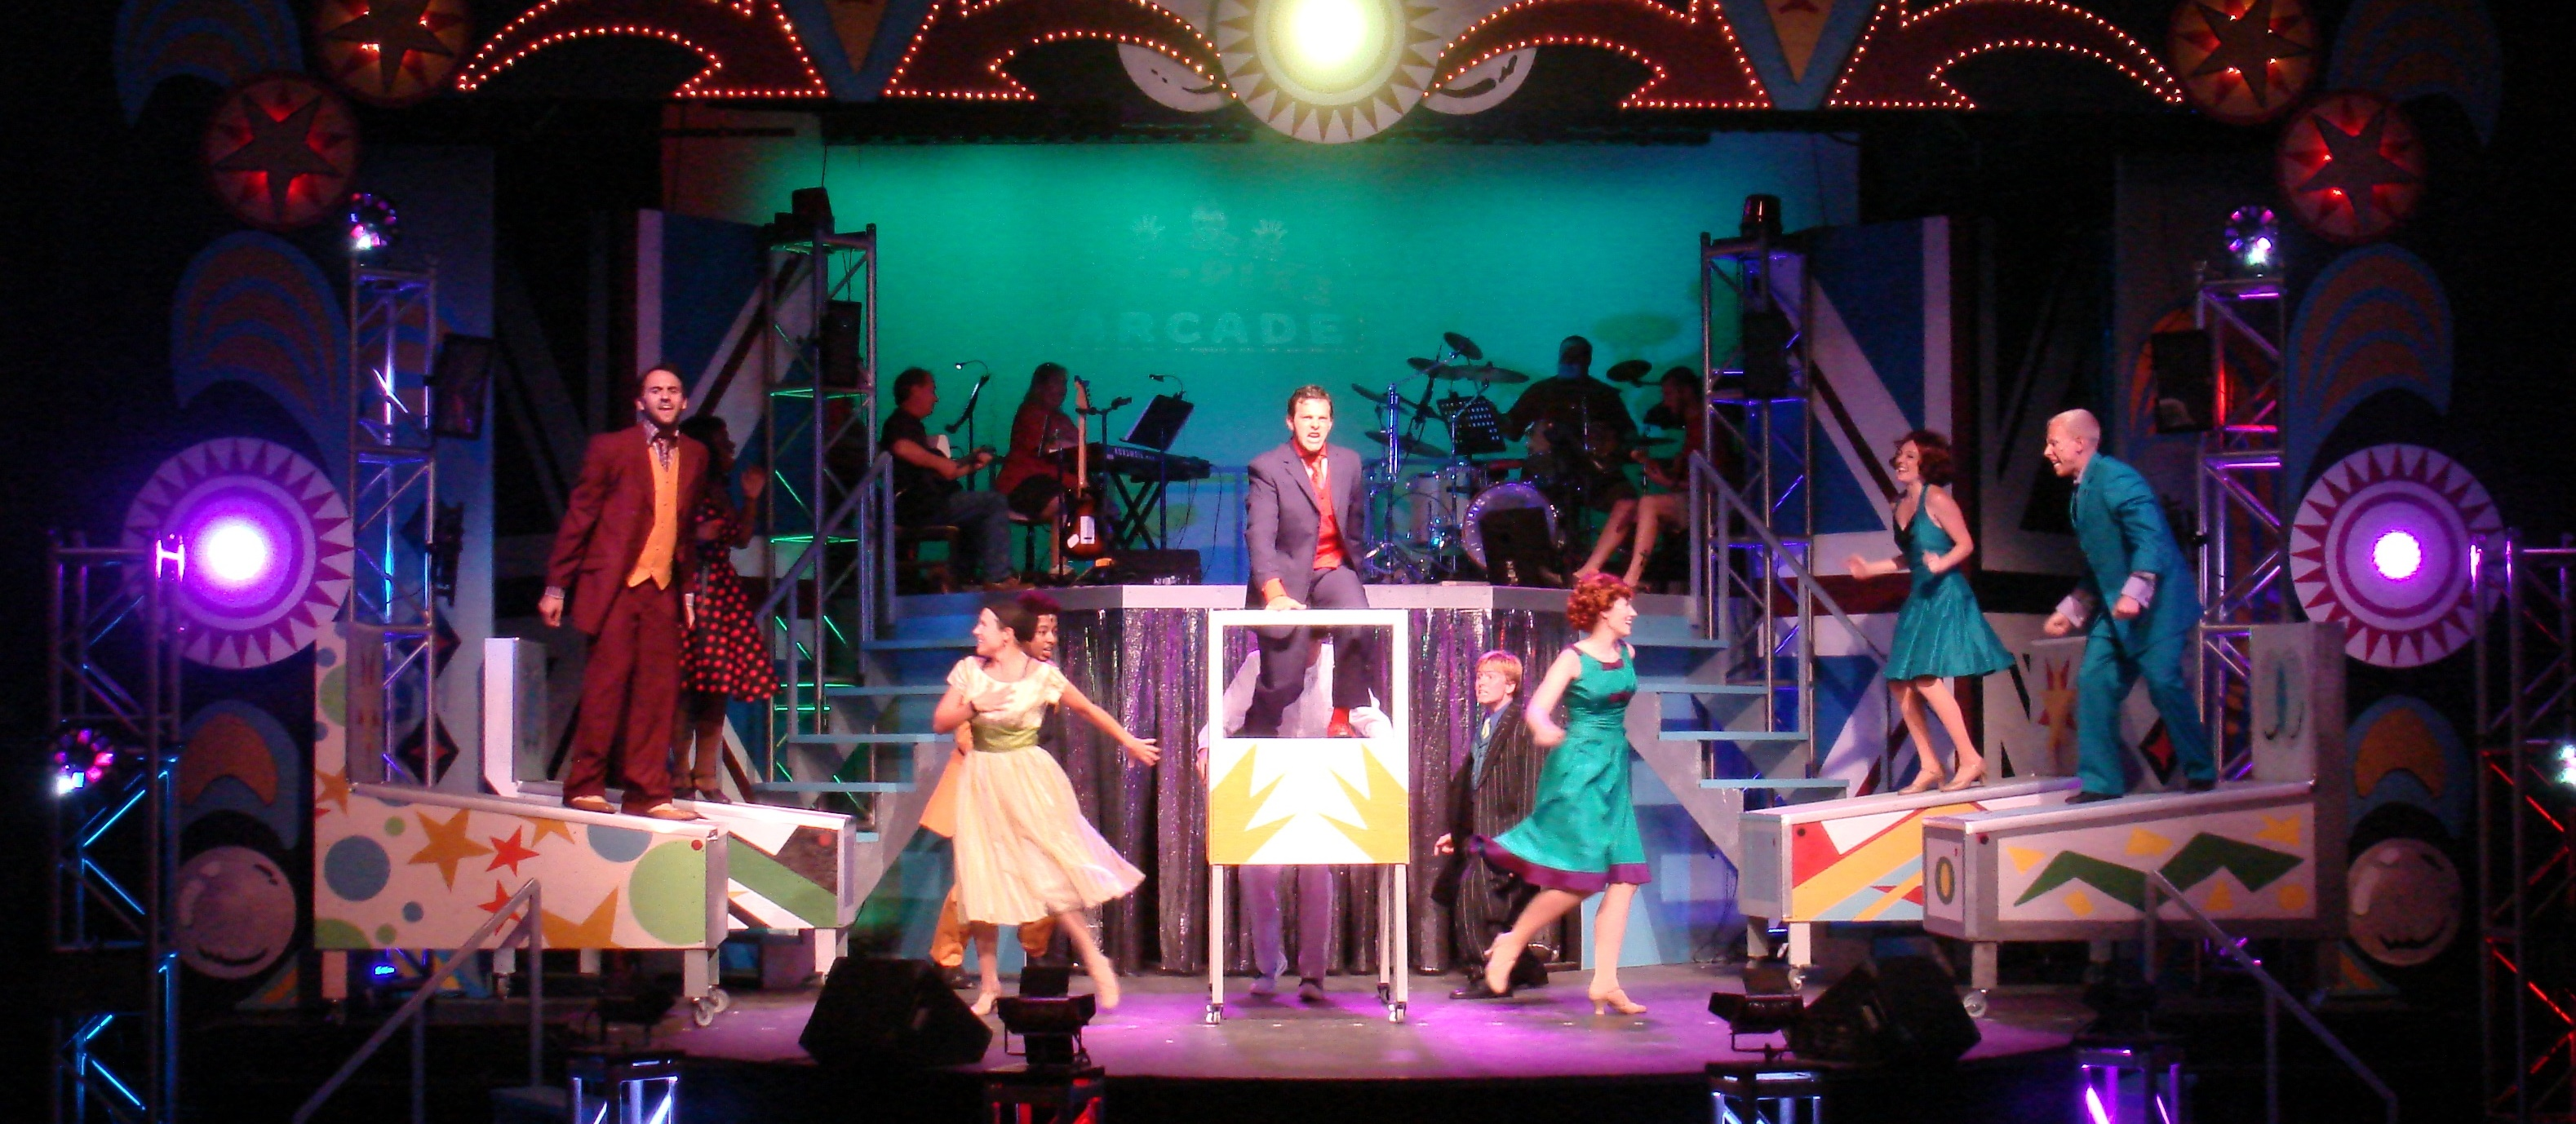 CenterStage Announces New Season Lineup